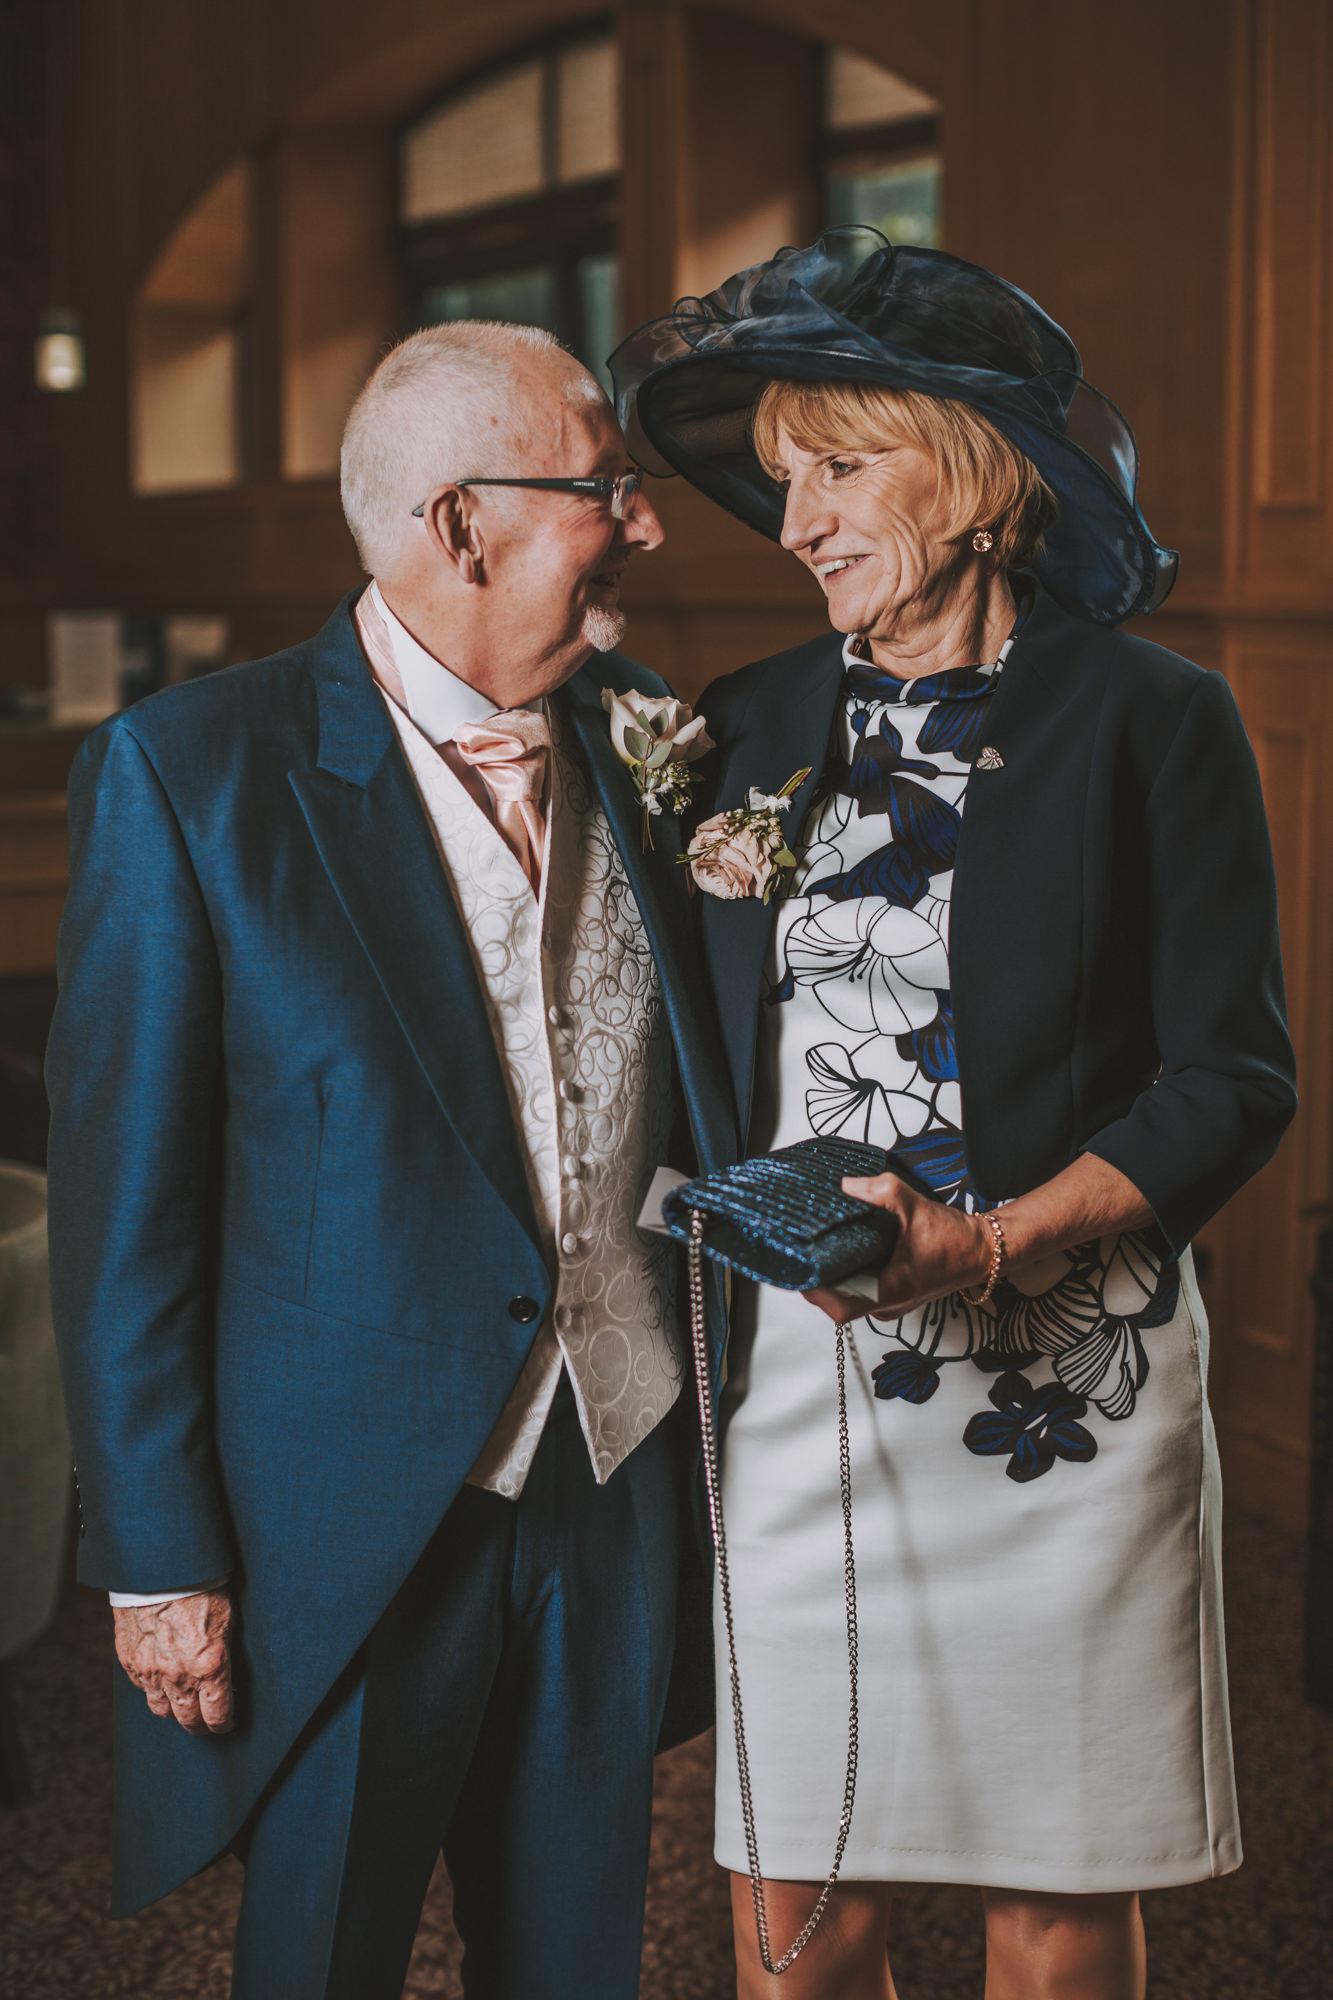 hellaby hall wedding photographers in rotherham, yorkshire-67.jpg